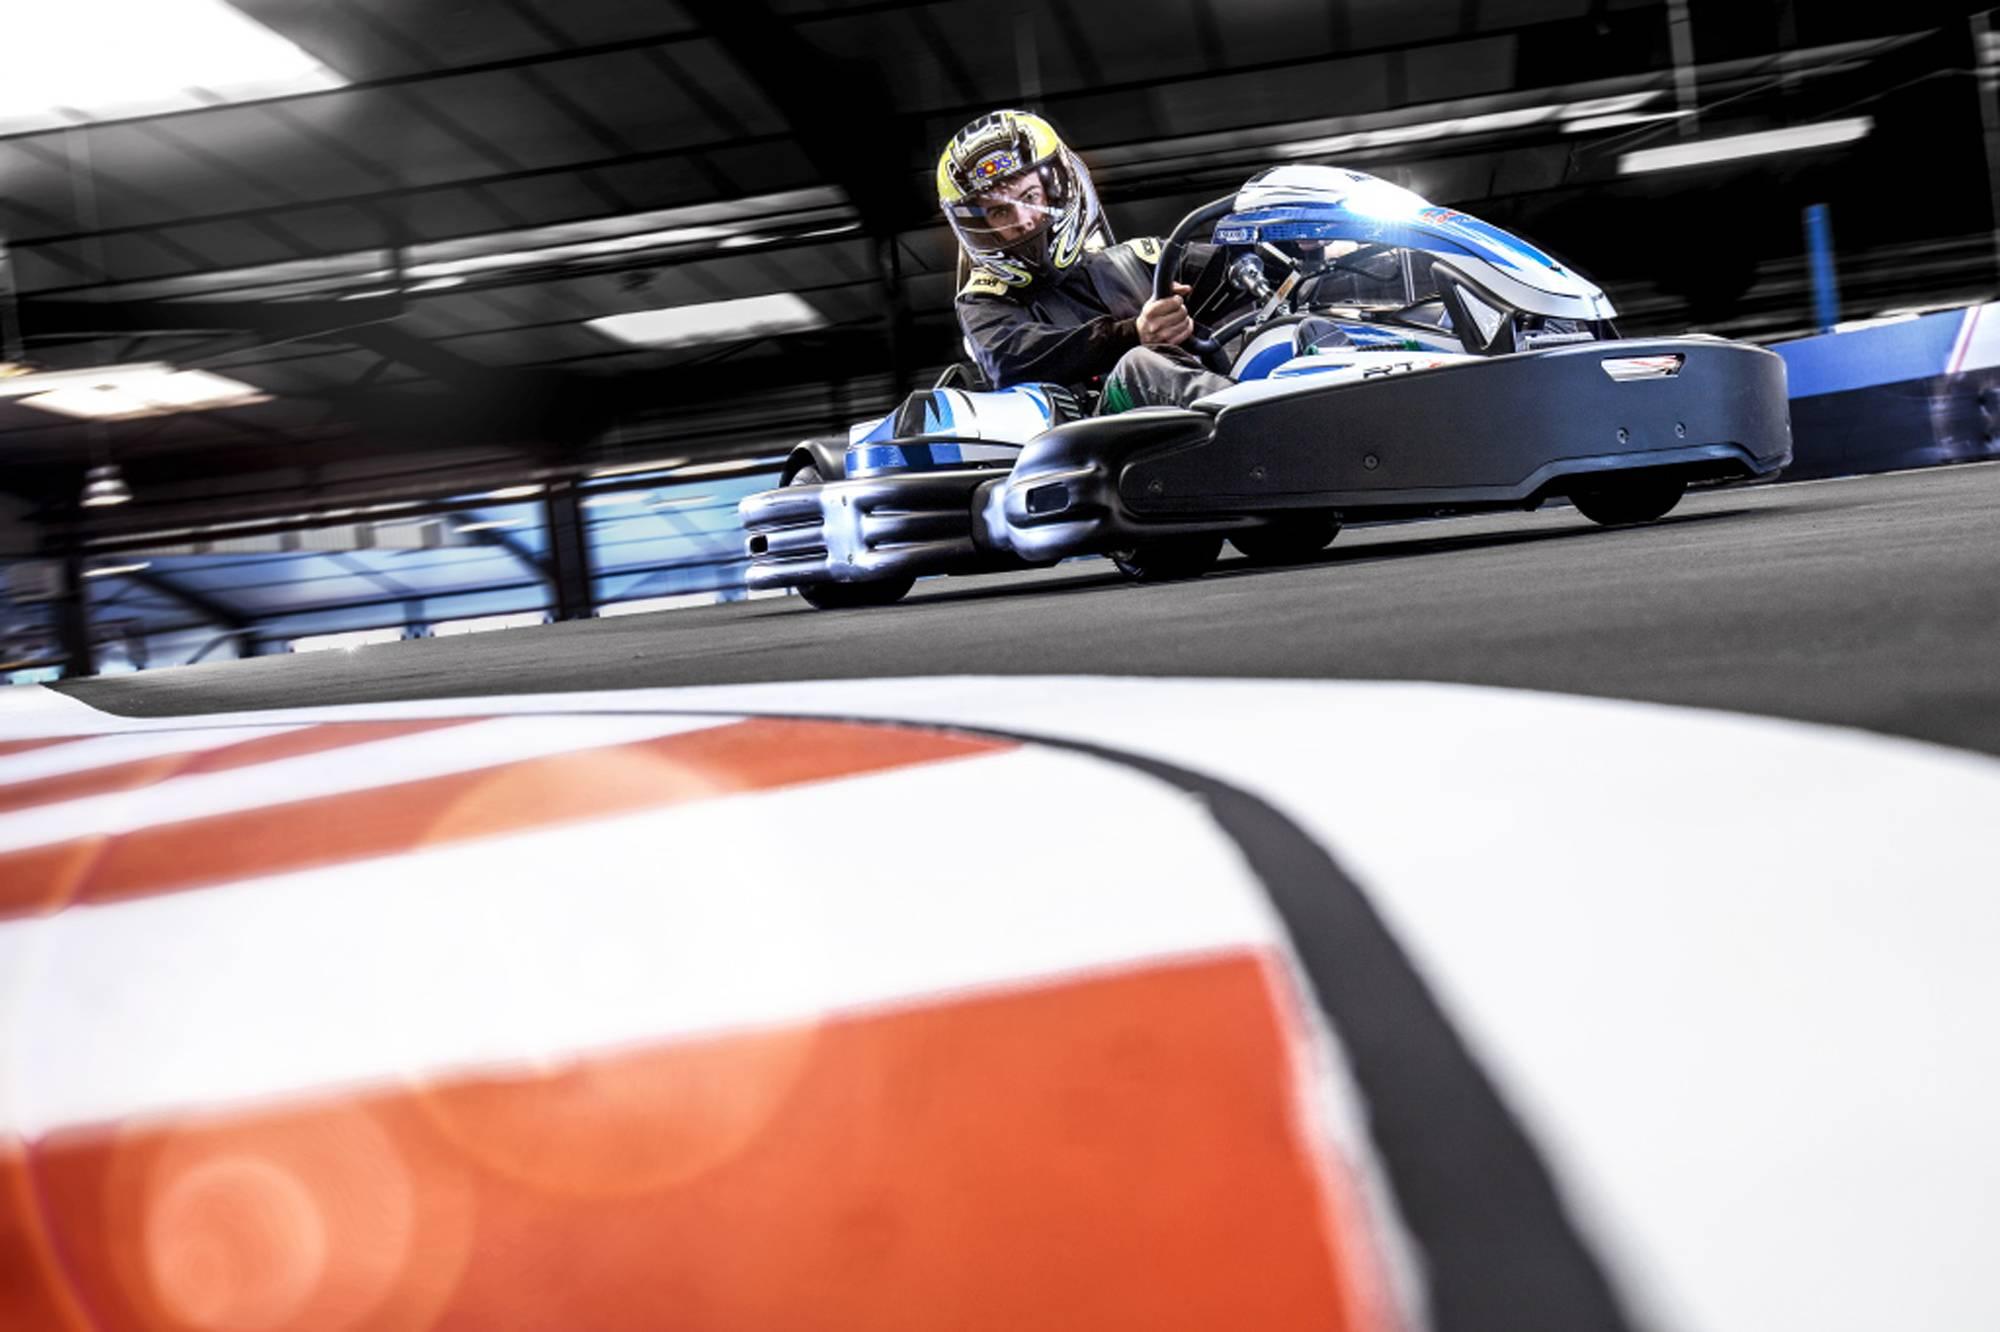 offre spéciale afterwork karting lyon